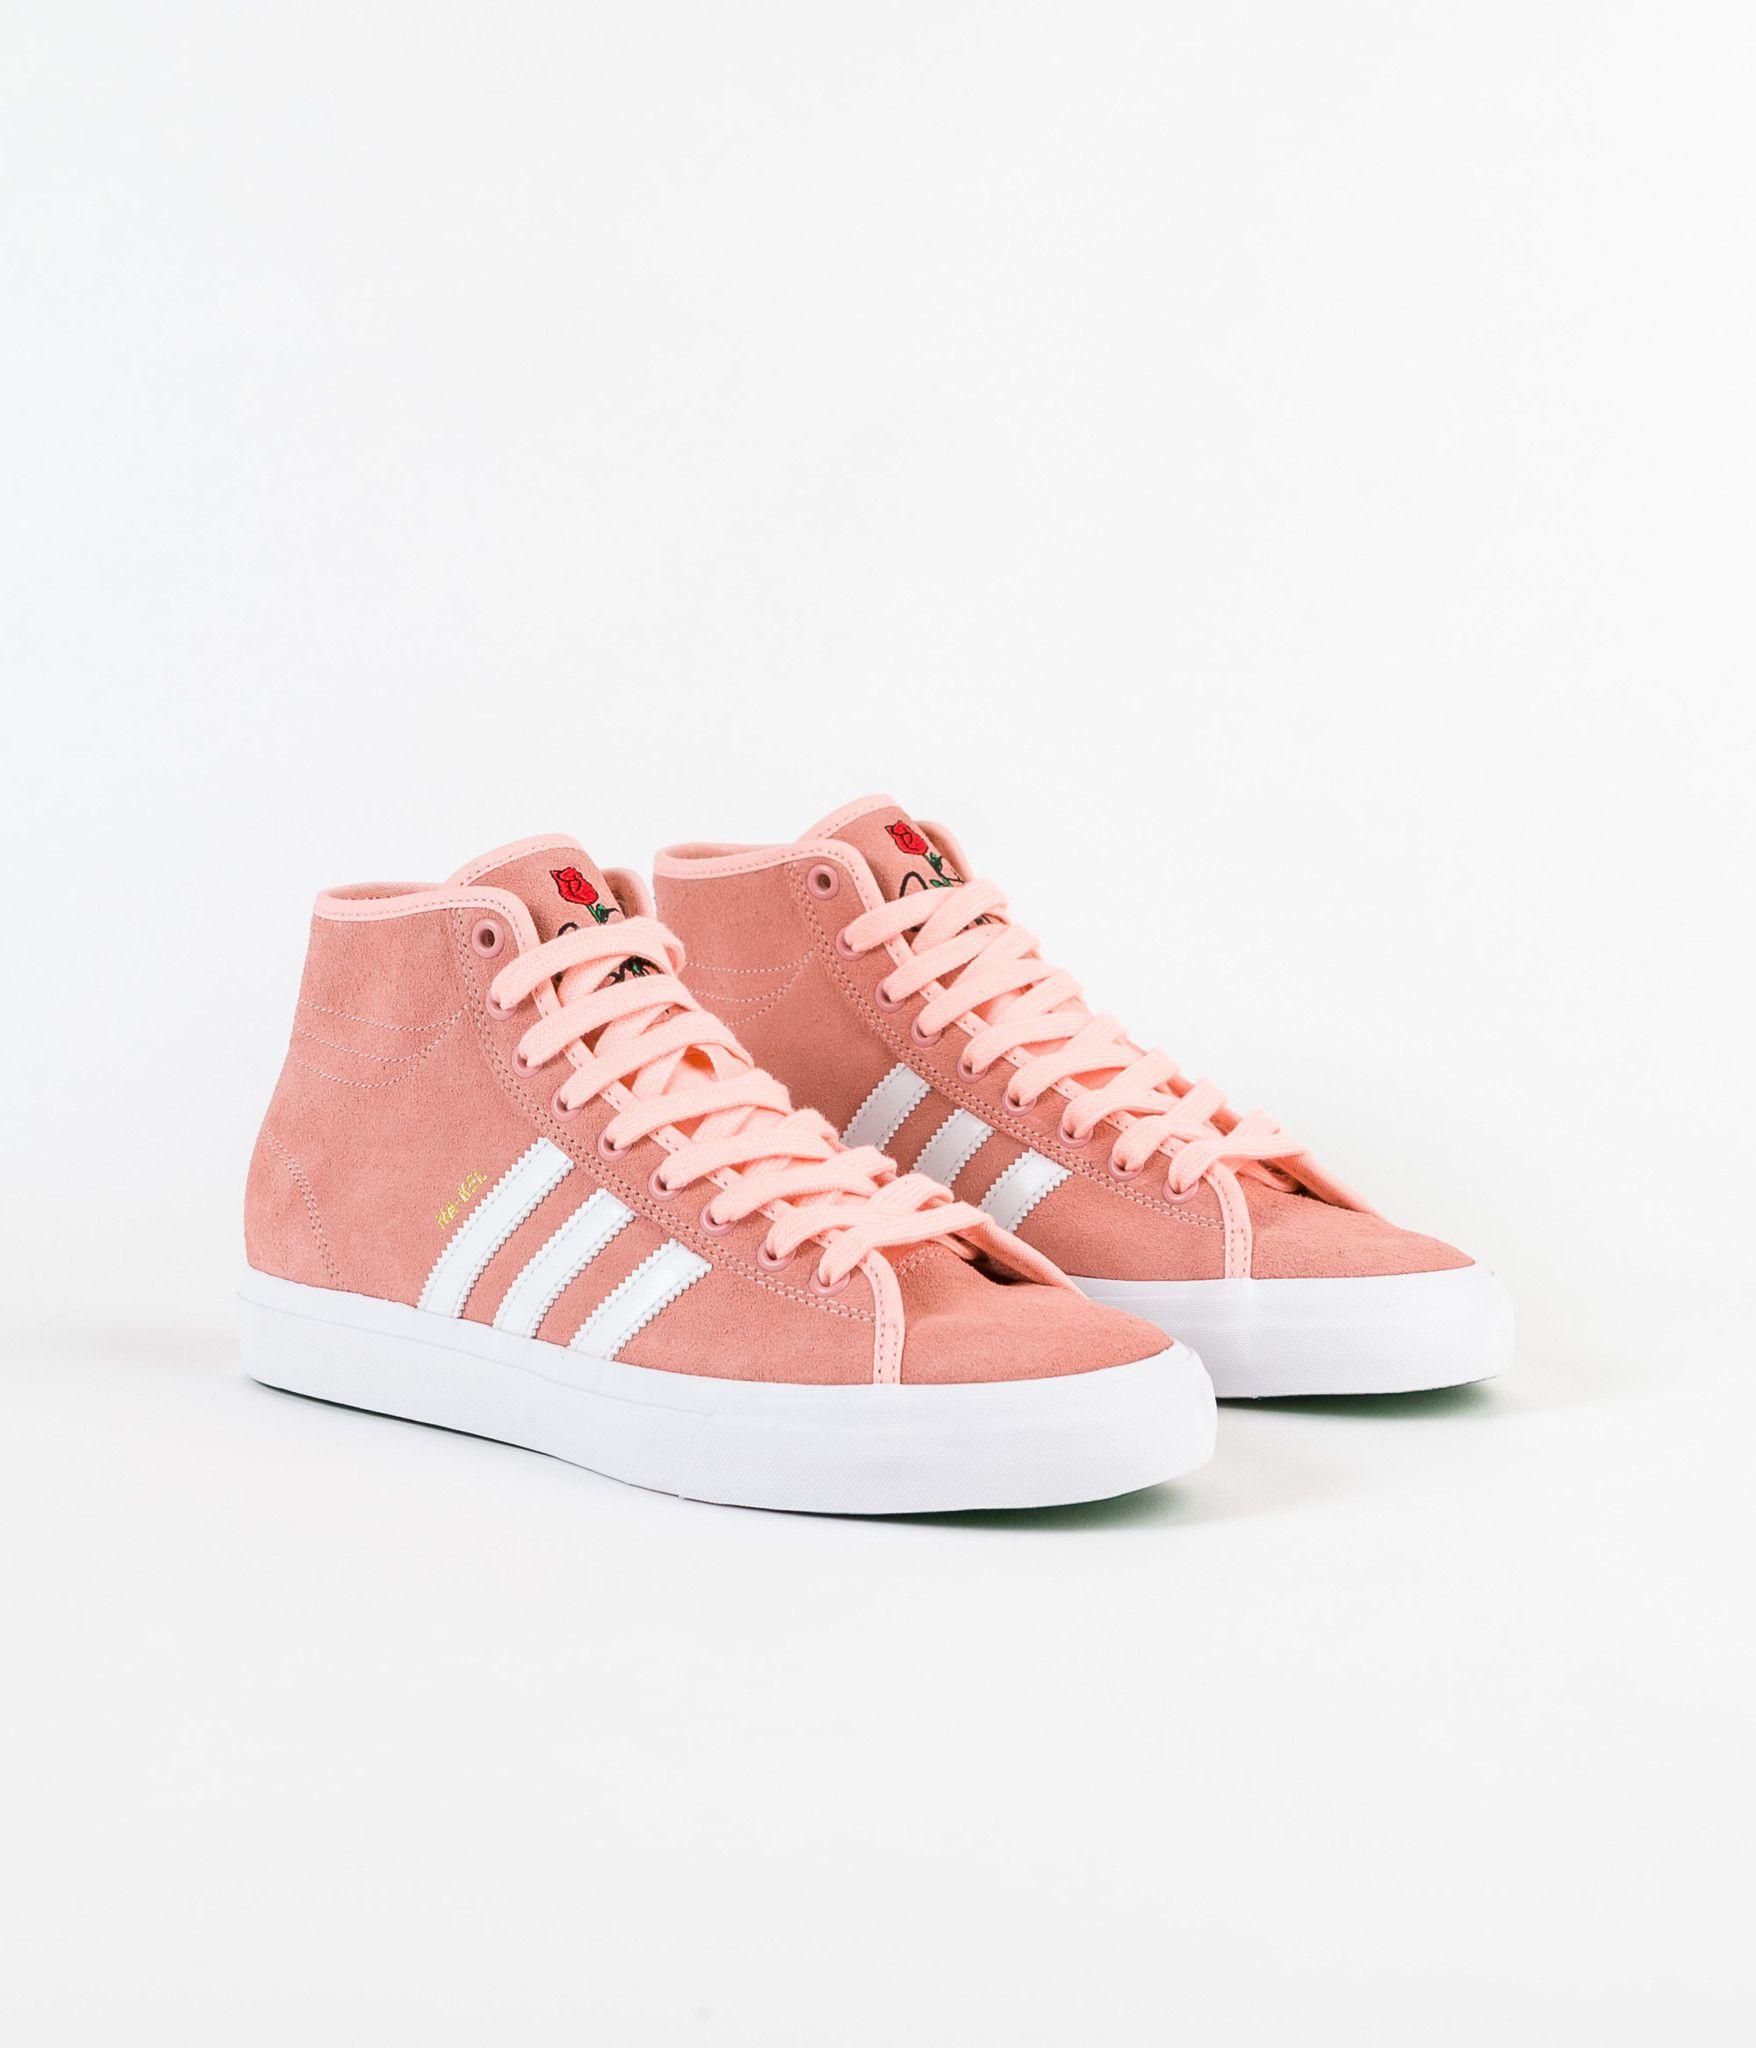 Adidas Matchcourt High RX 'Nakel' Shoes - Haze Coral / White / Haze Coral